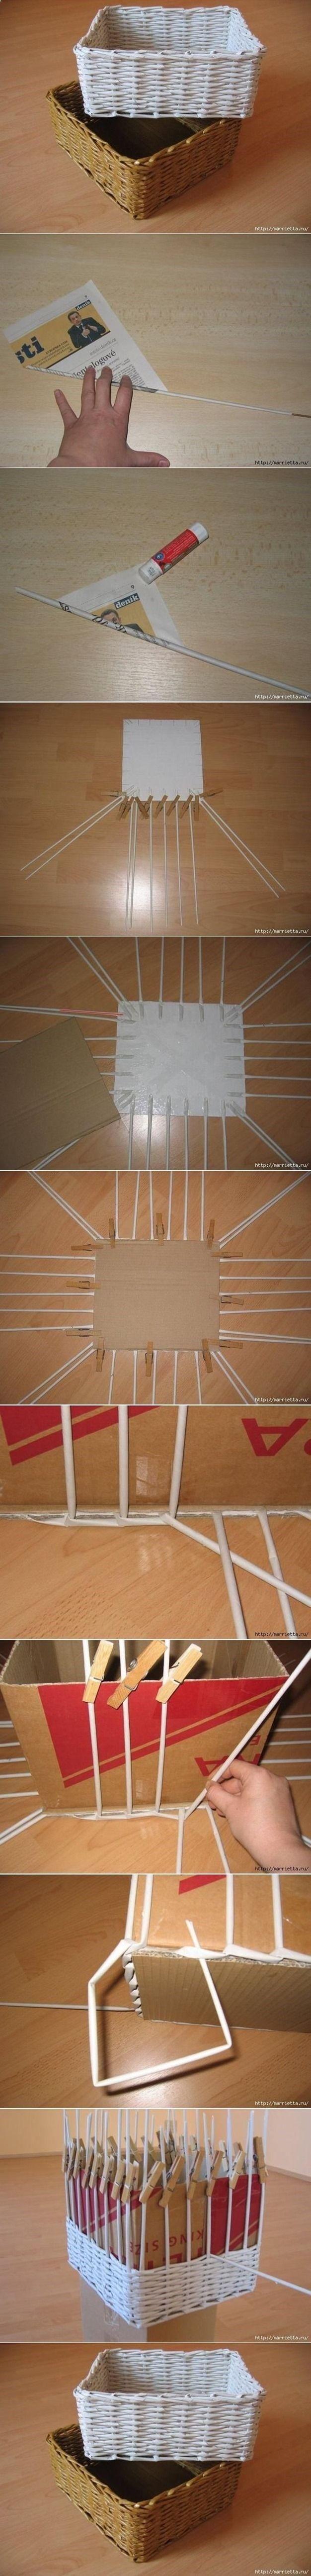 woven_paper_basket